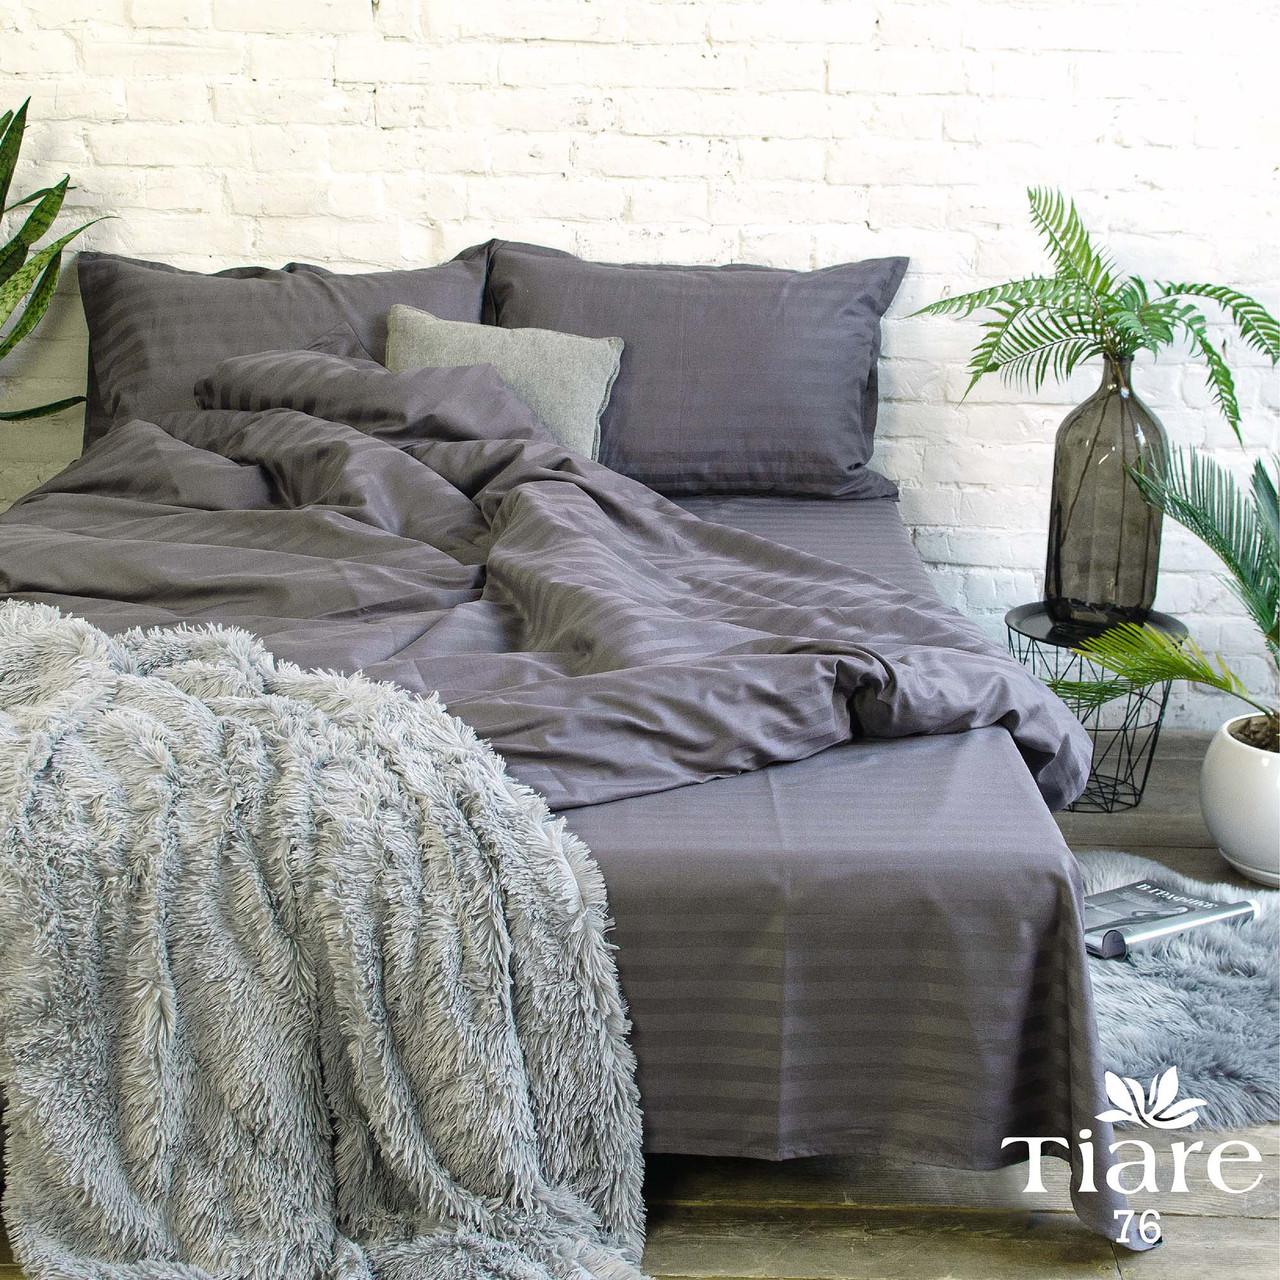 Комплект постельного белья Tiare Евро Сатин Stripe арт. 76